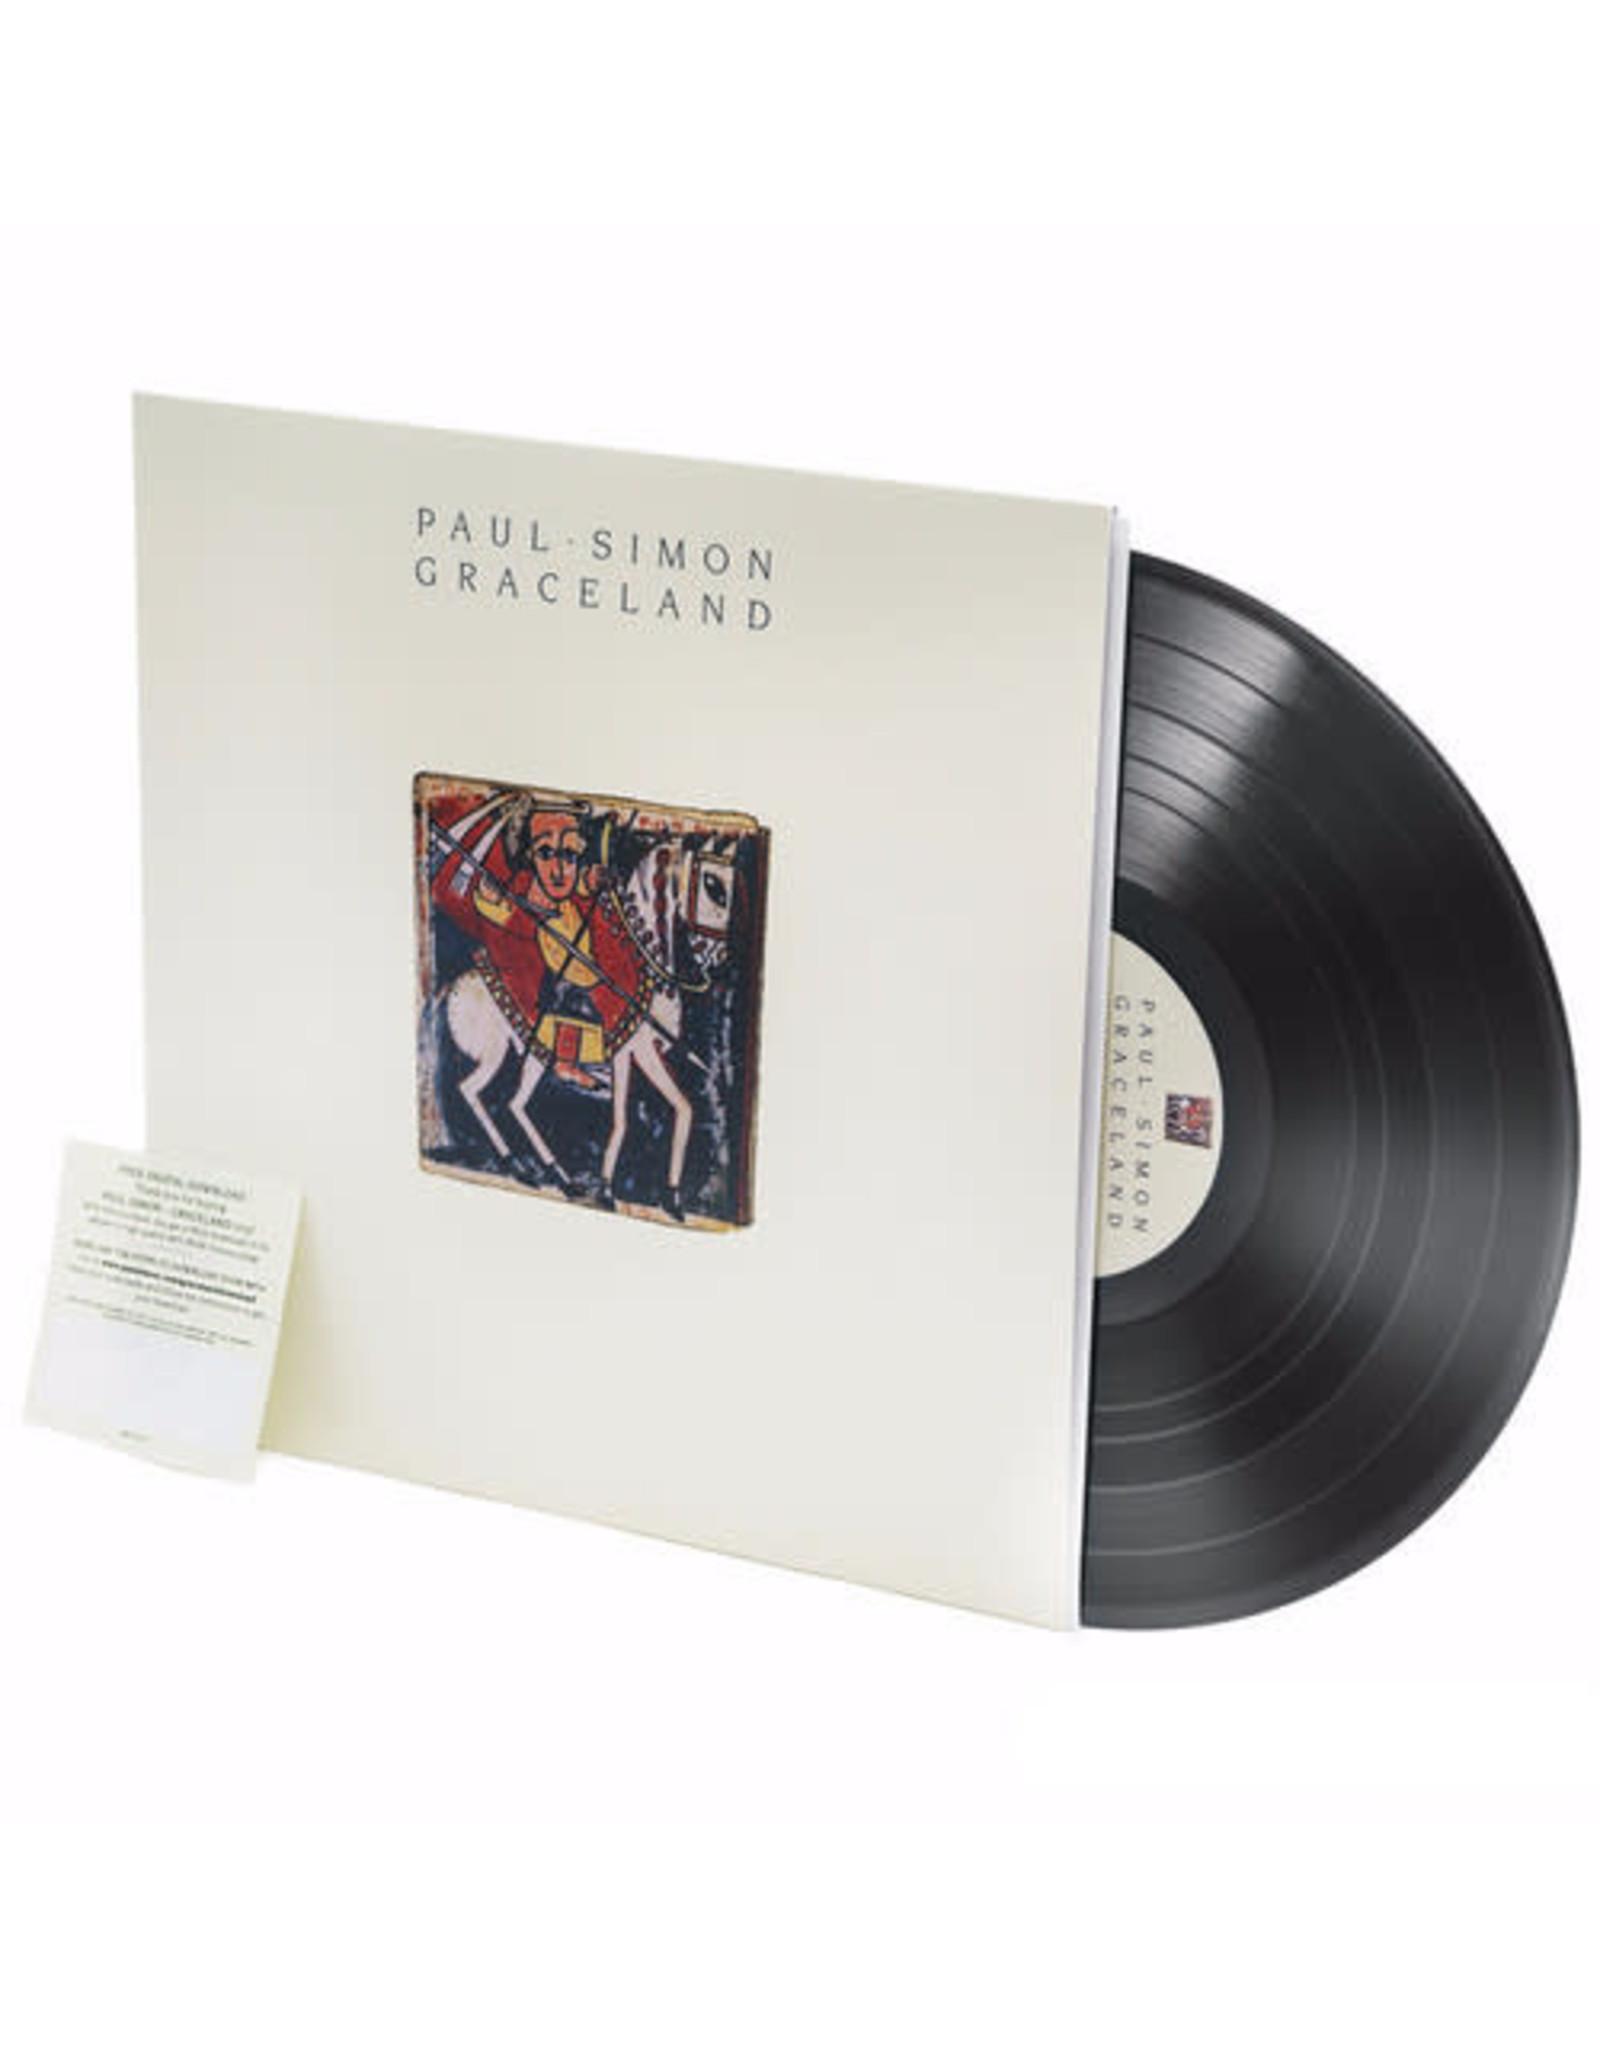 New Vinyl Paul Simon - Graceland (25th Anniversary Edition) LP